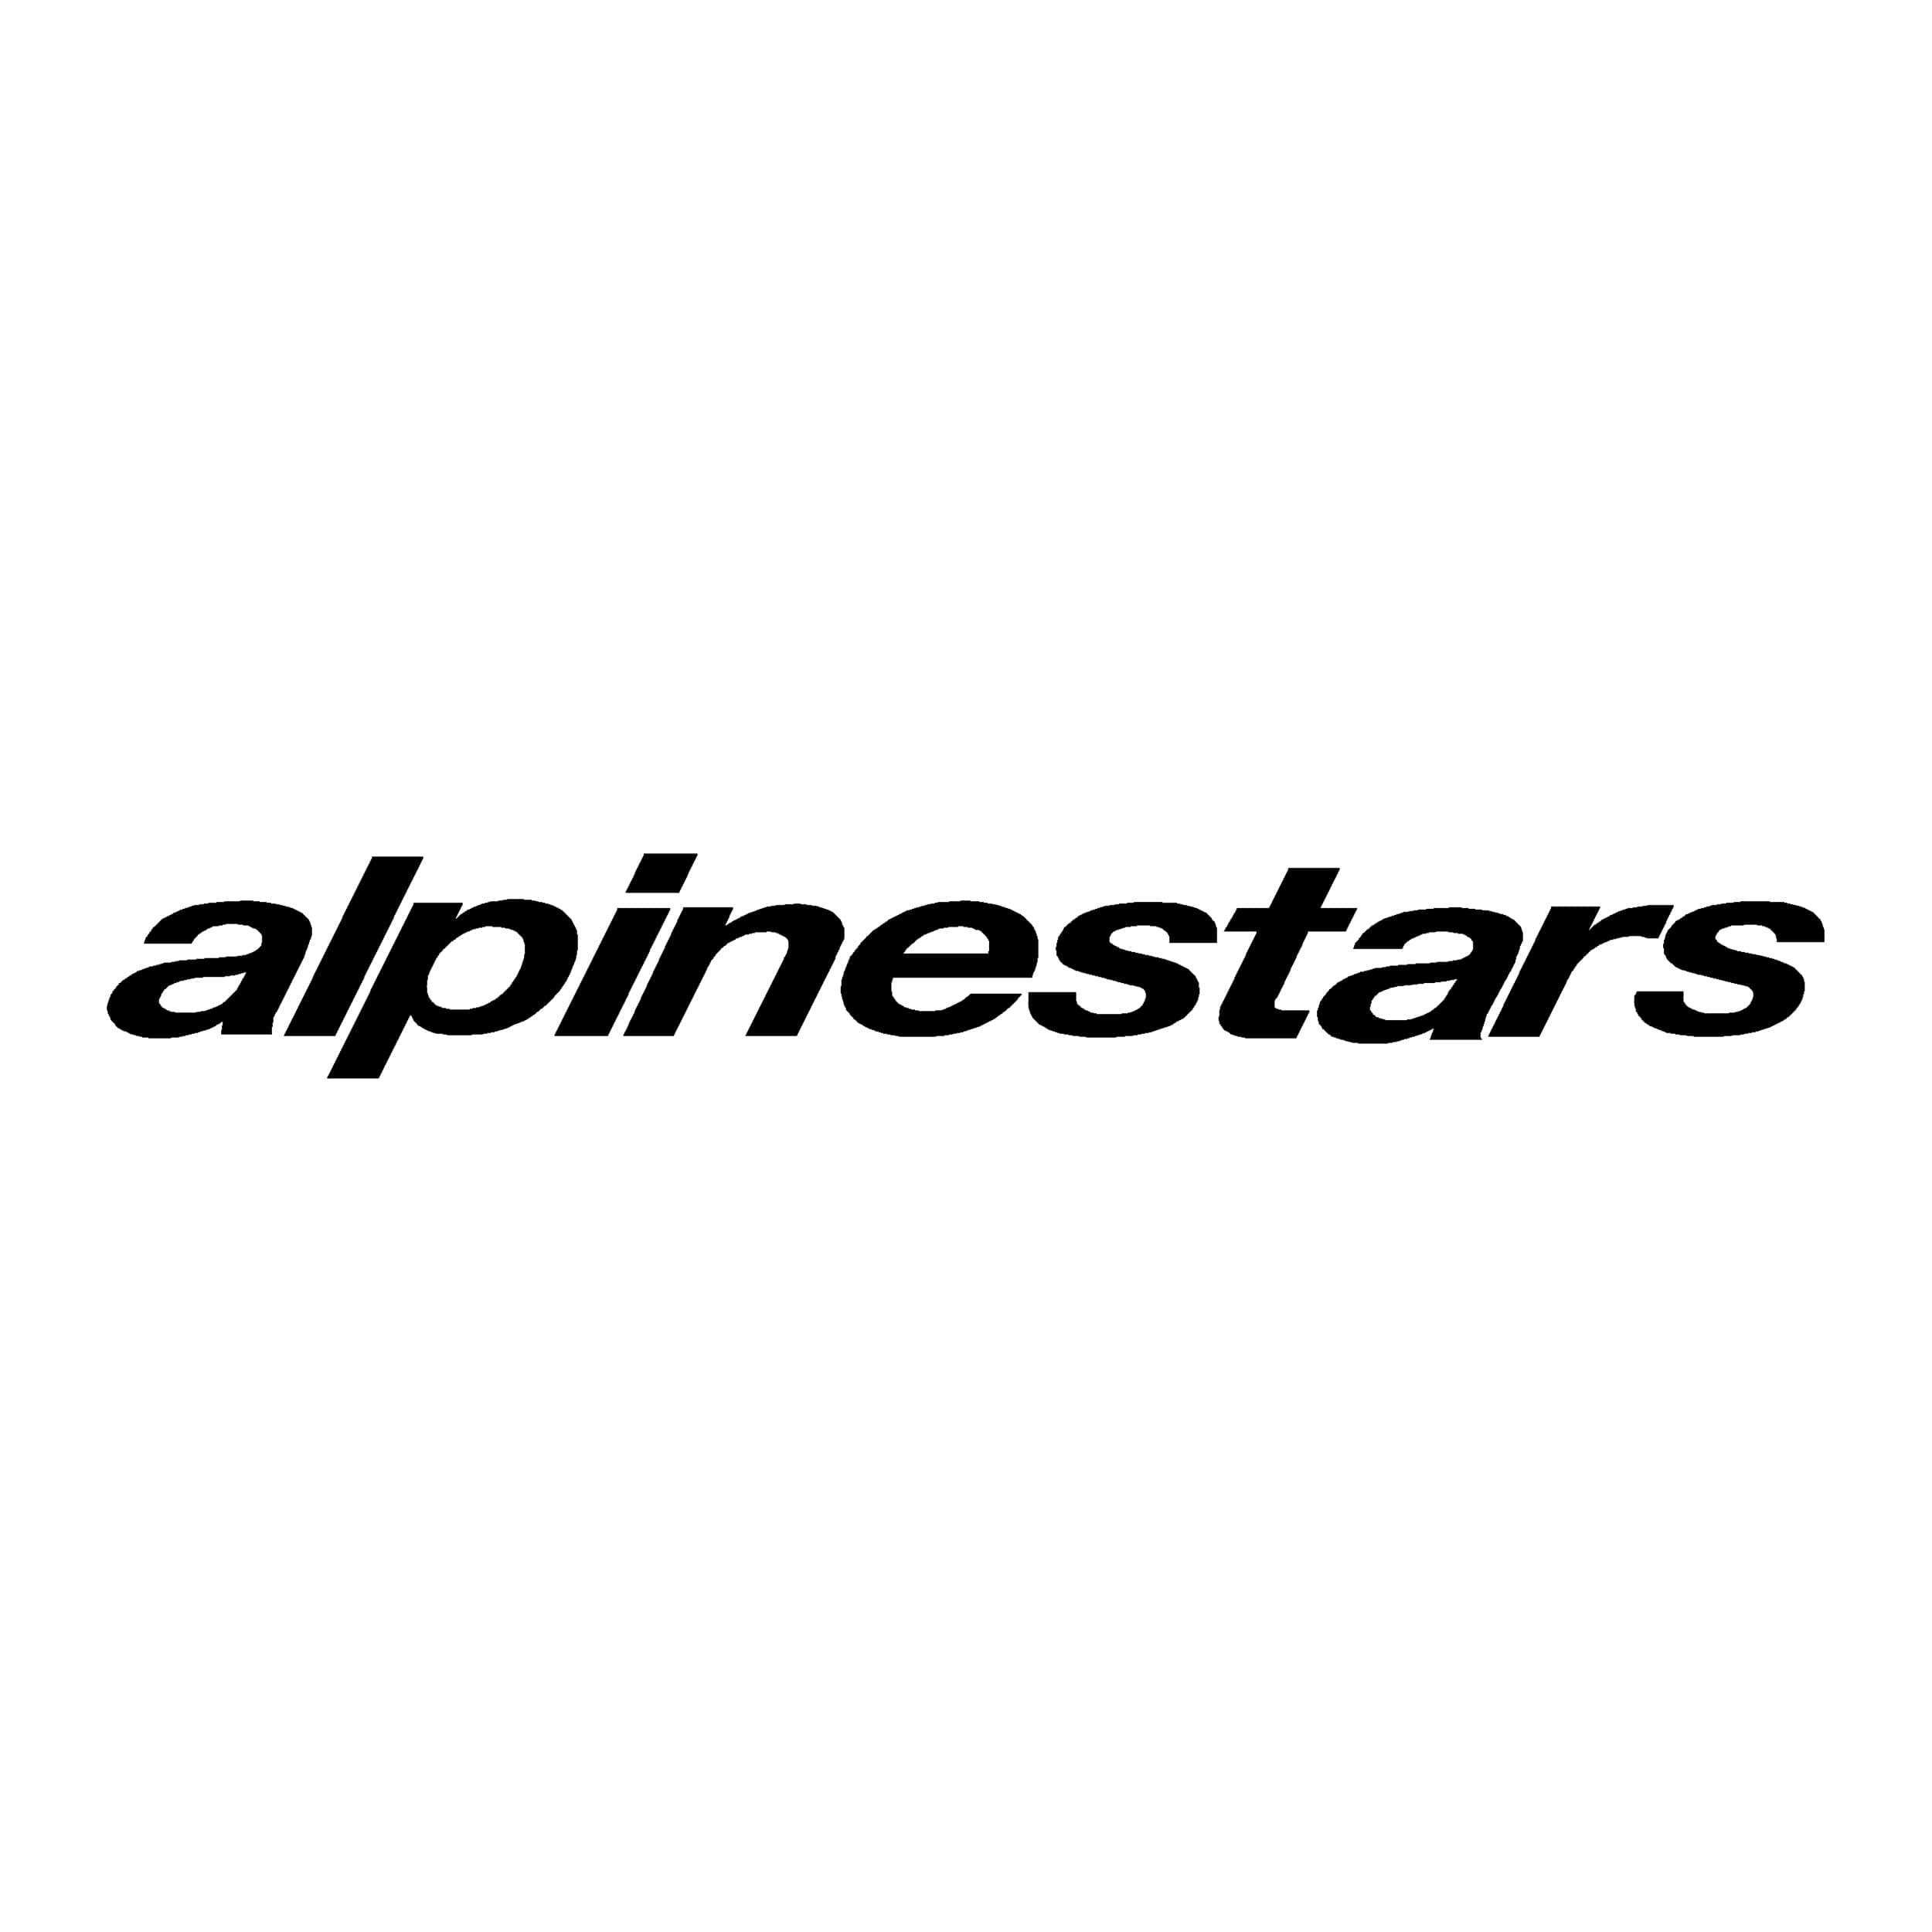 stickers-alpinestars-alpine-stars-ref2-tuning-autocollant-sticker-sponsors-car-auto-moto-camion-bike-velo-vtt-competition-deco-rallye-min